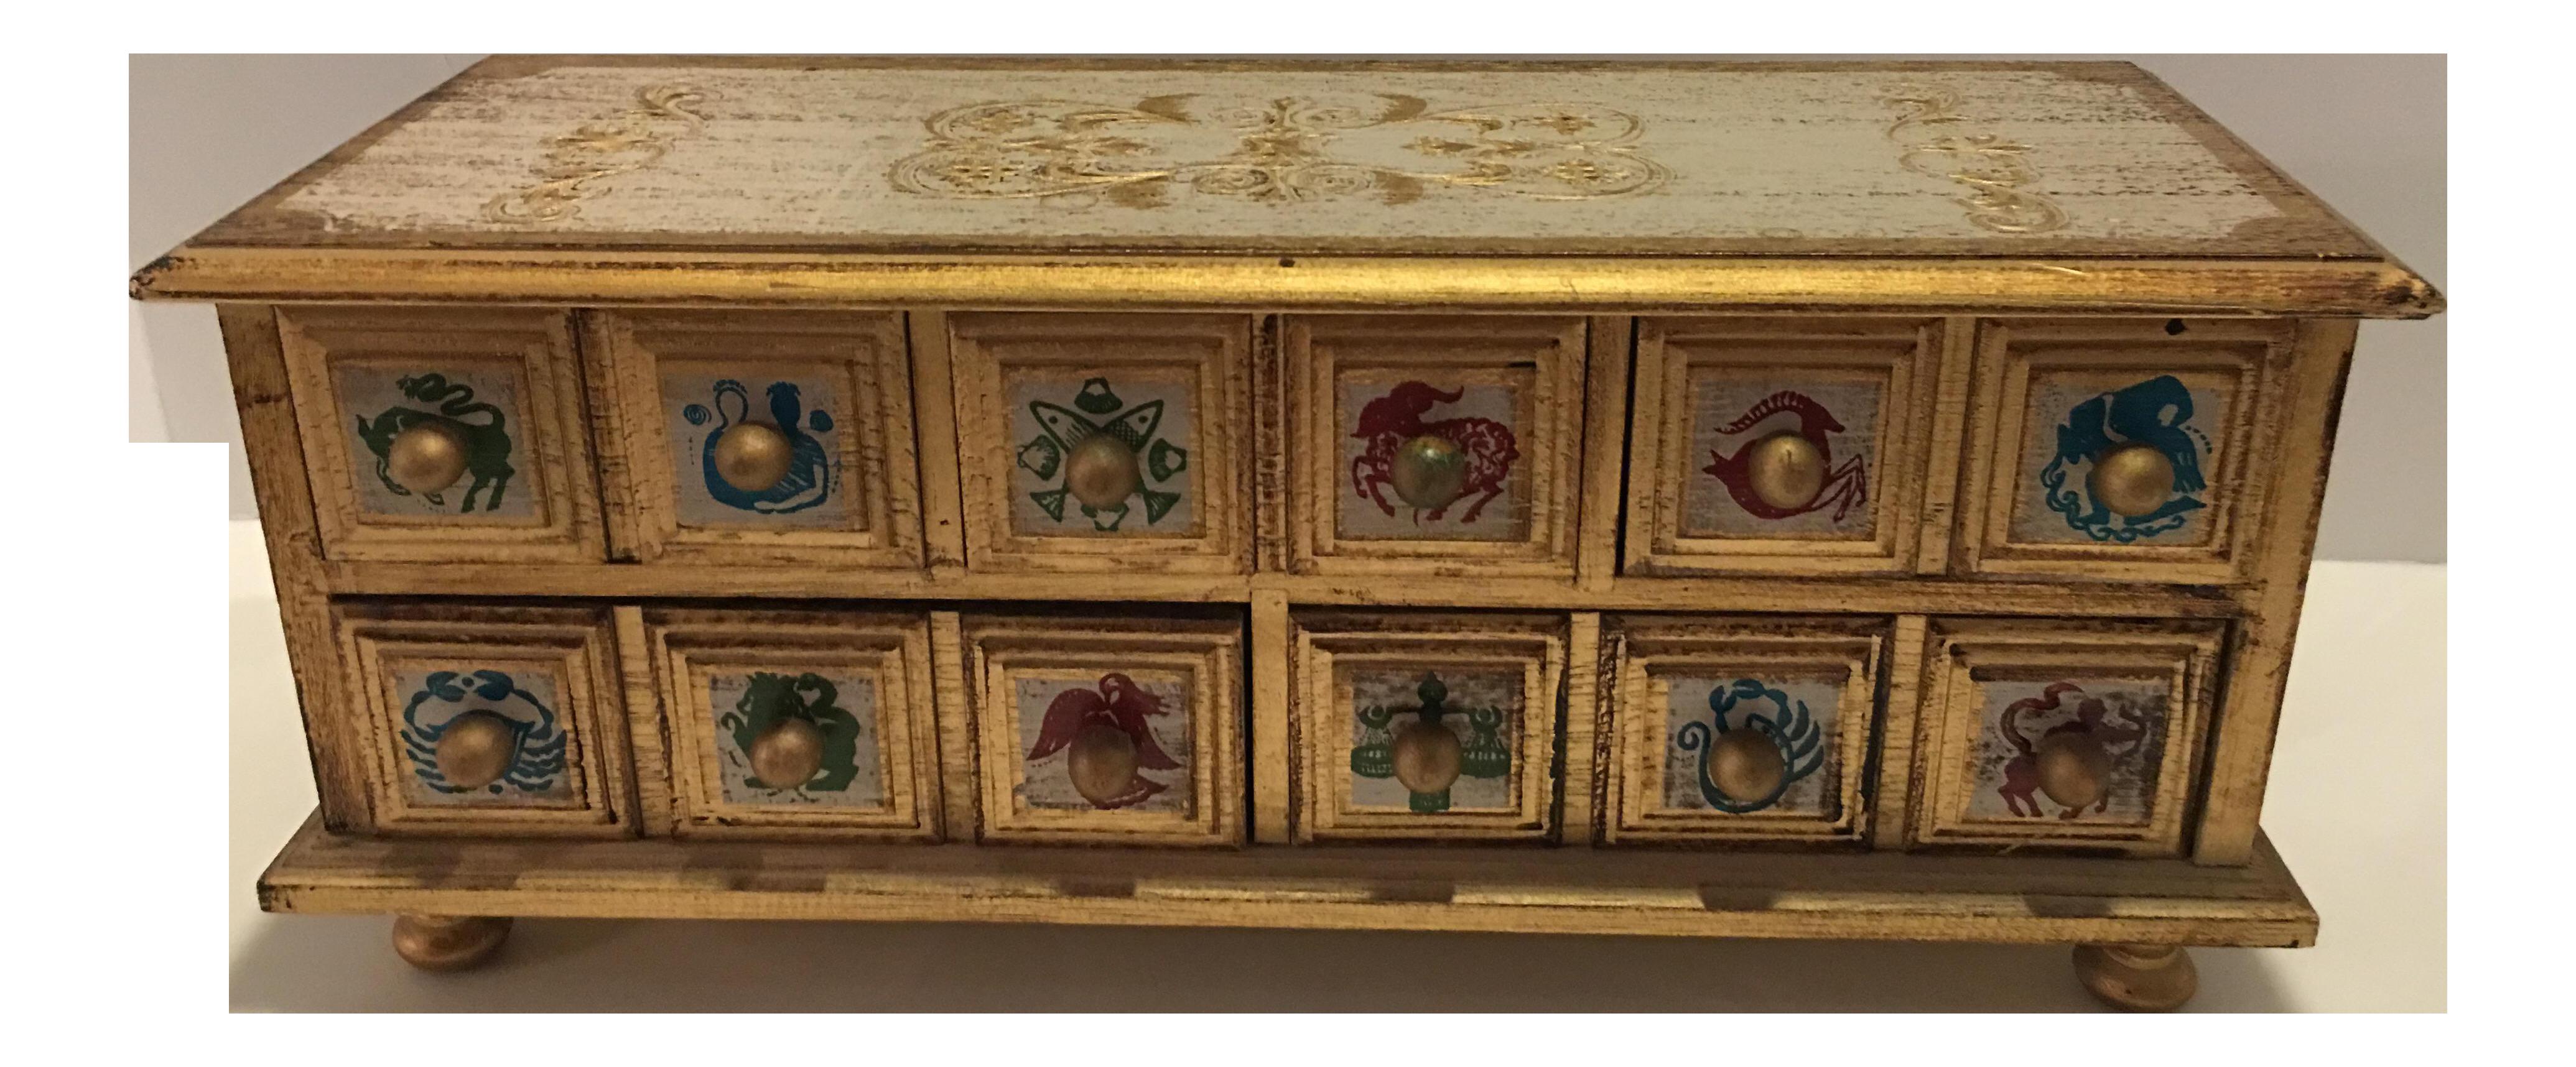 Hollywood Regency Gold Jewelry Storage Box Chairish